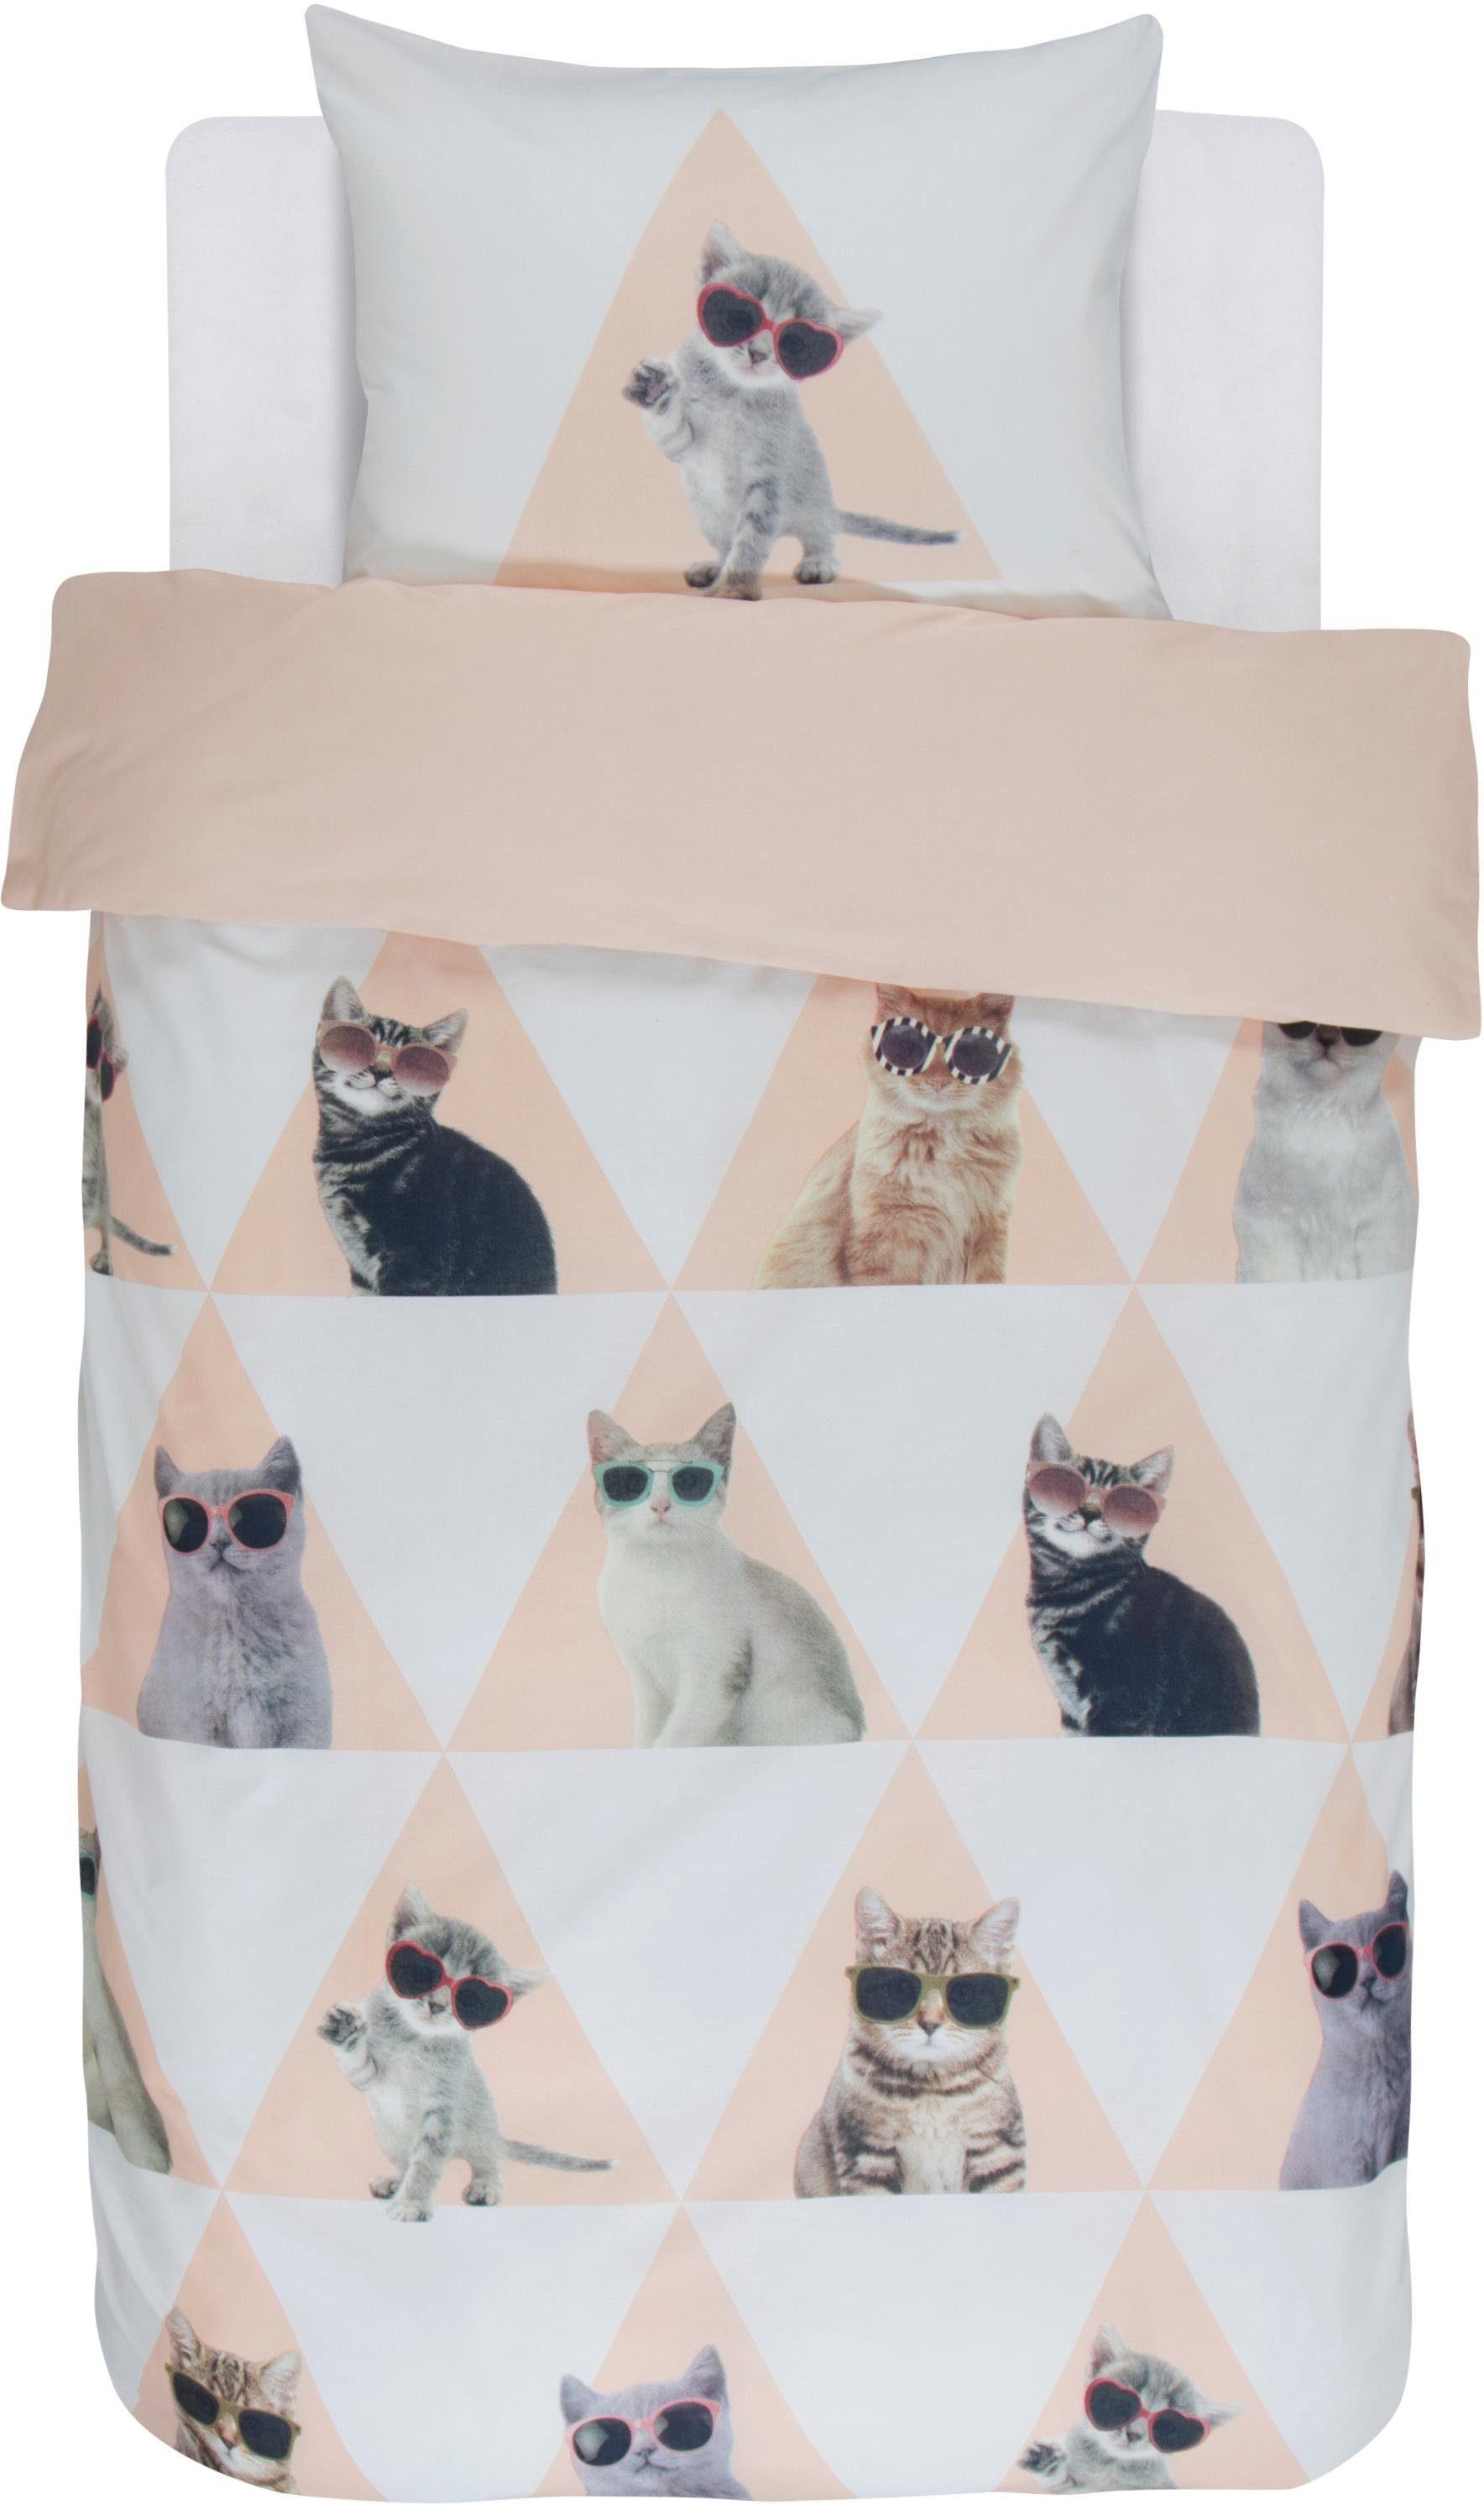 Jugendbettwäsche »Cool cats«, Covers & Co, mit Katzen